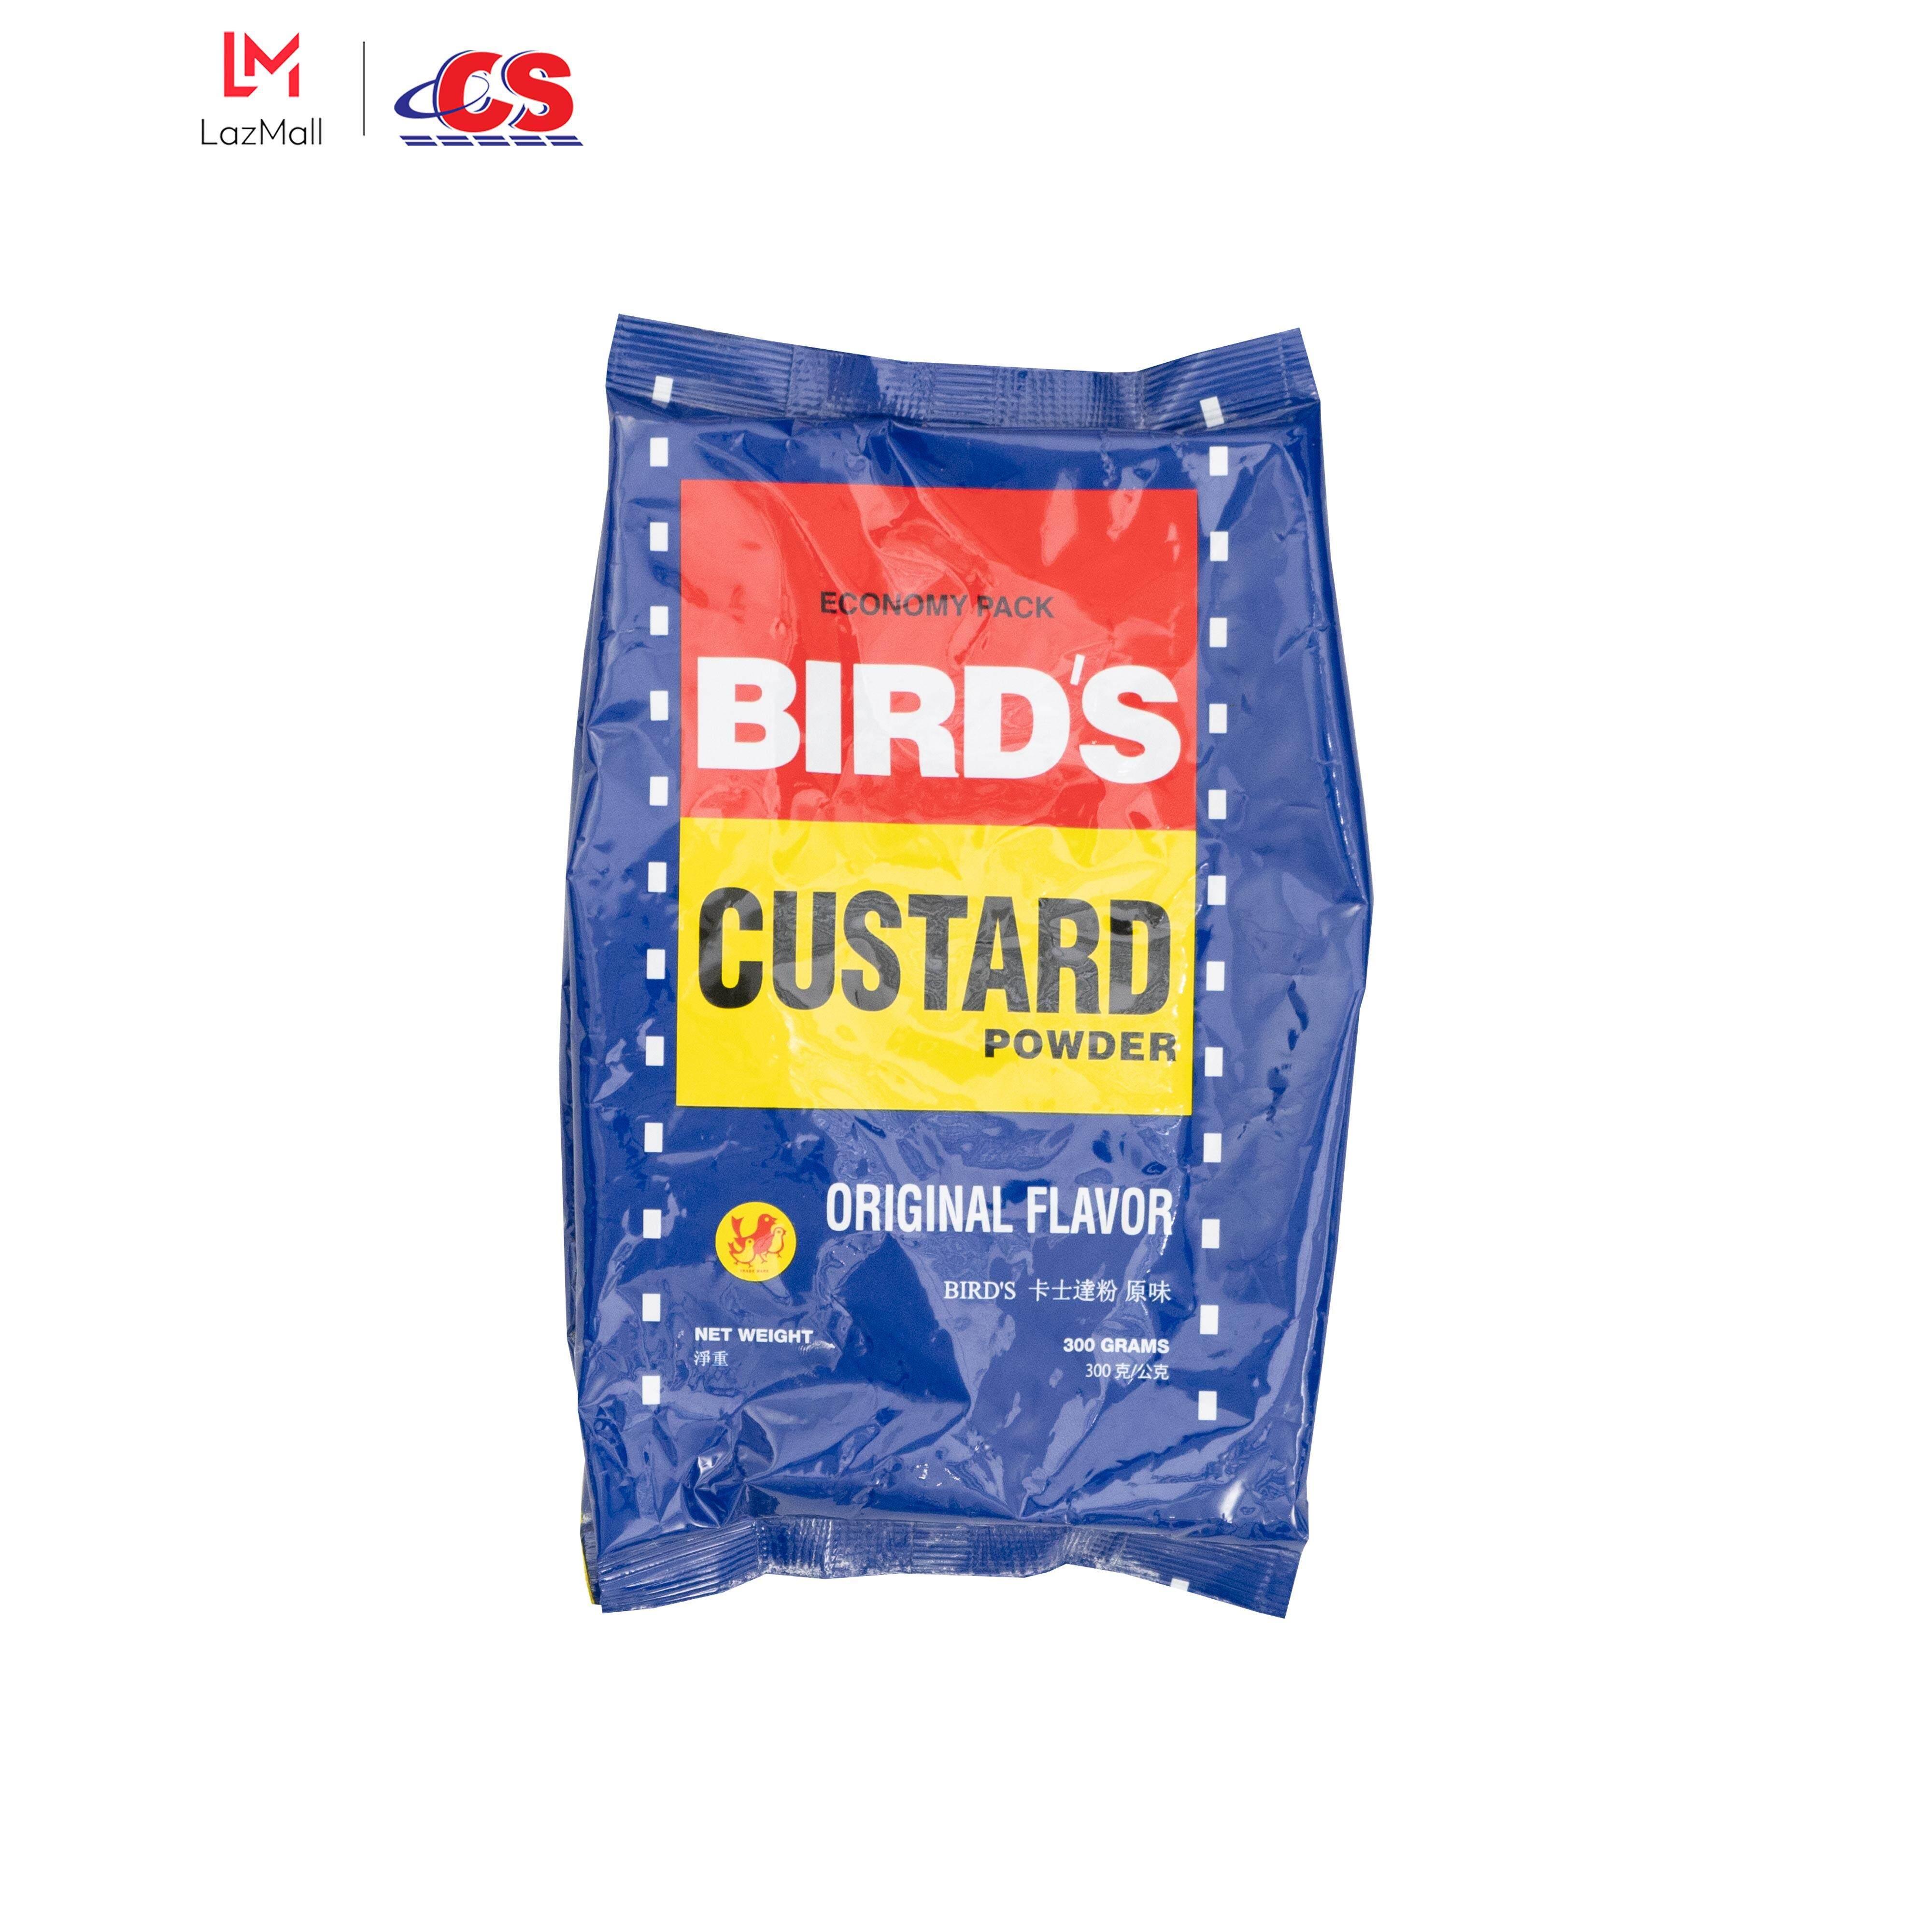 BIRD'S Custard Powder 300g